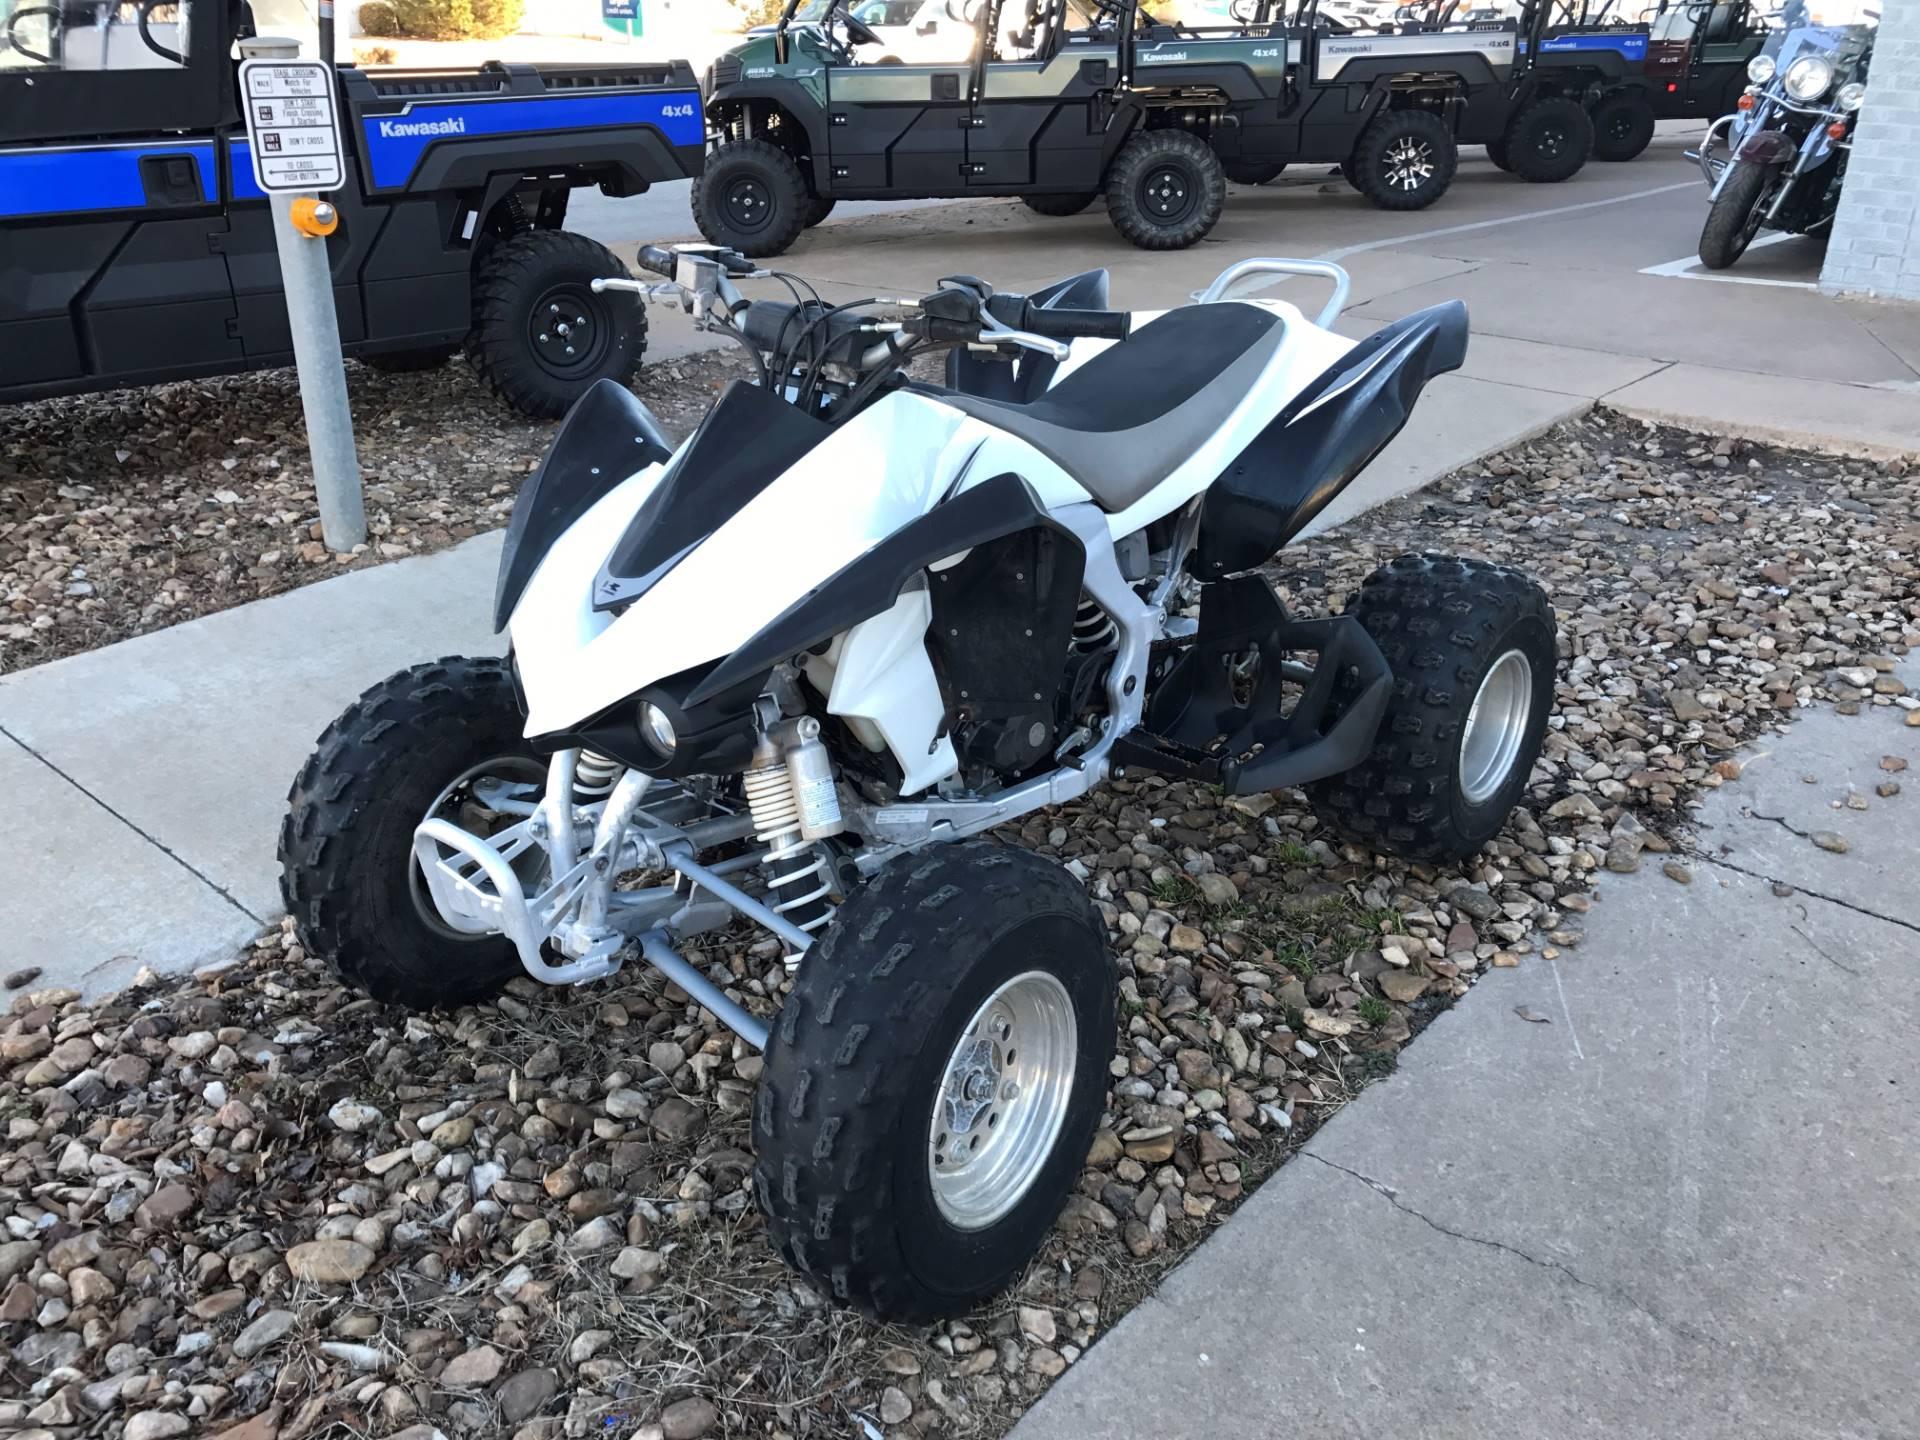 Used 2008 Kawasaki KFX® 450R ATVs in Stillwater, OK